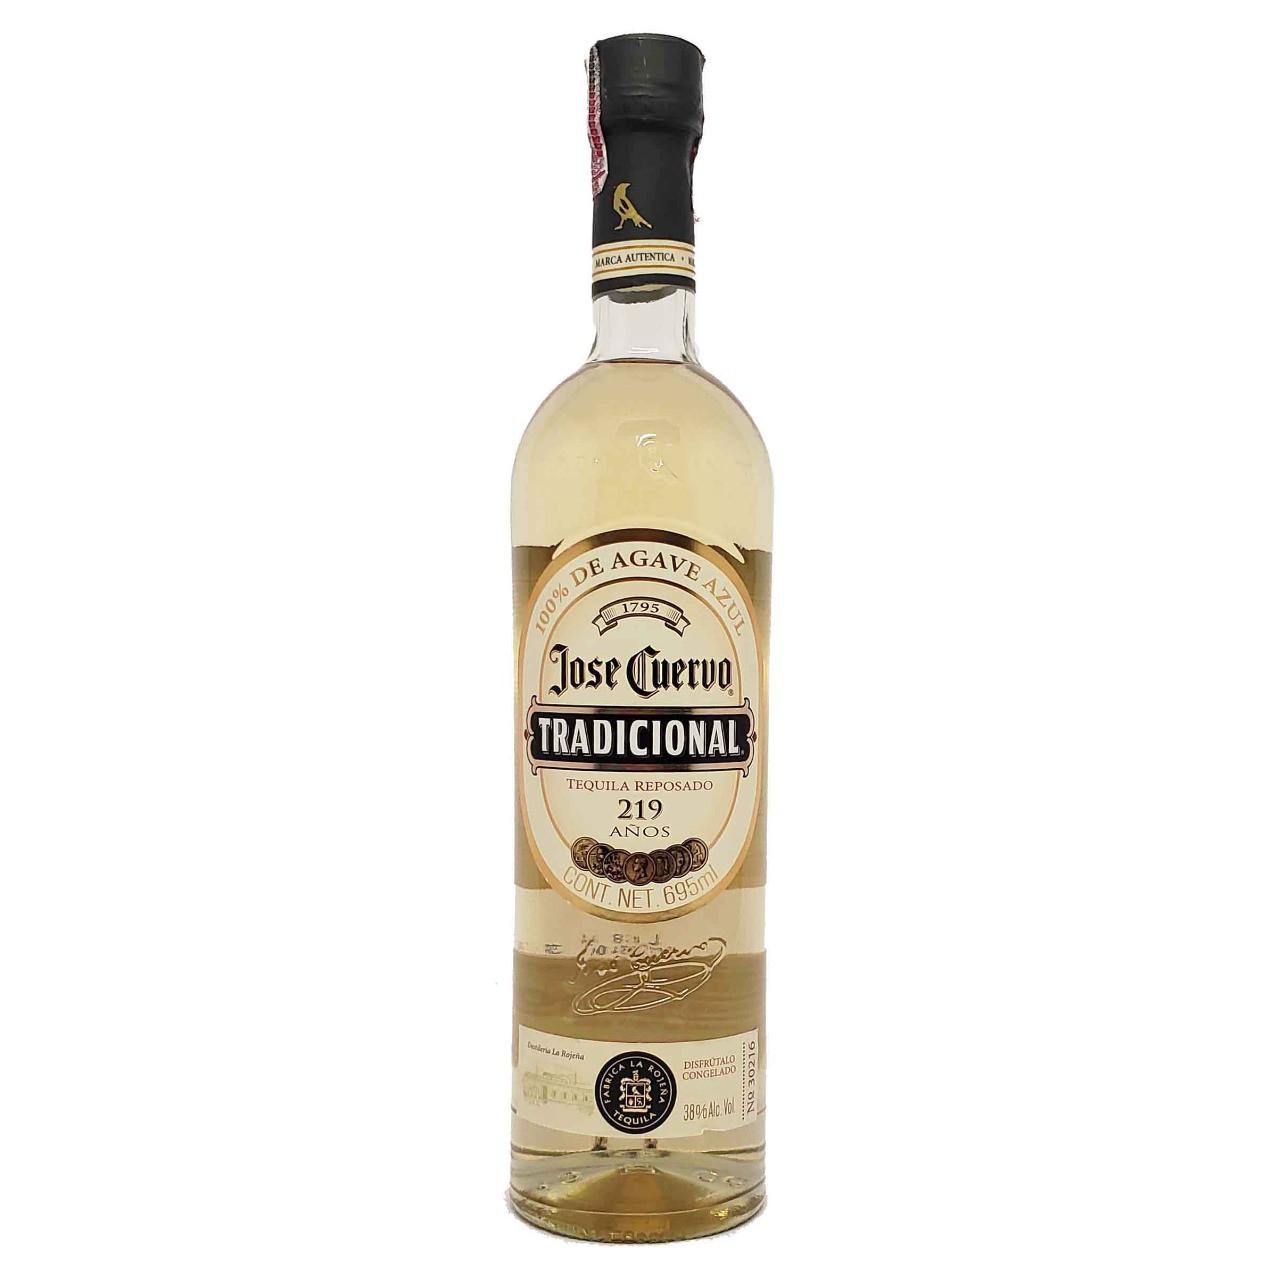 Tequila José Cuervo Tradicional - 695ml -